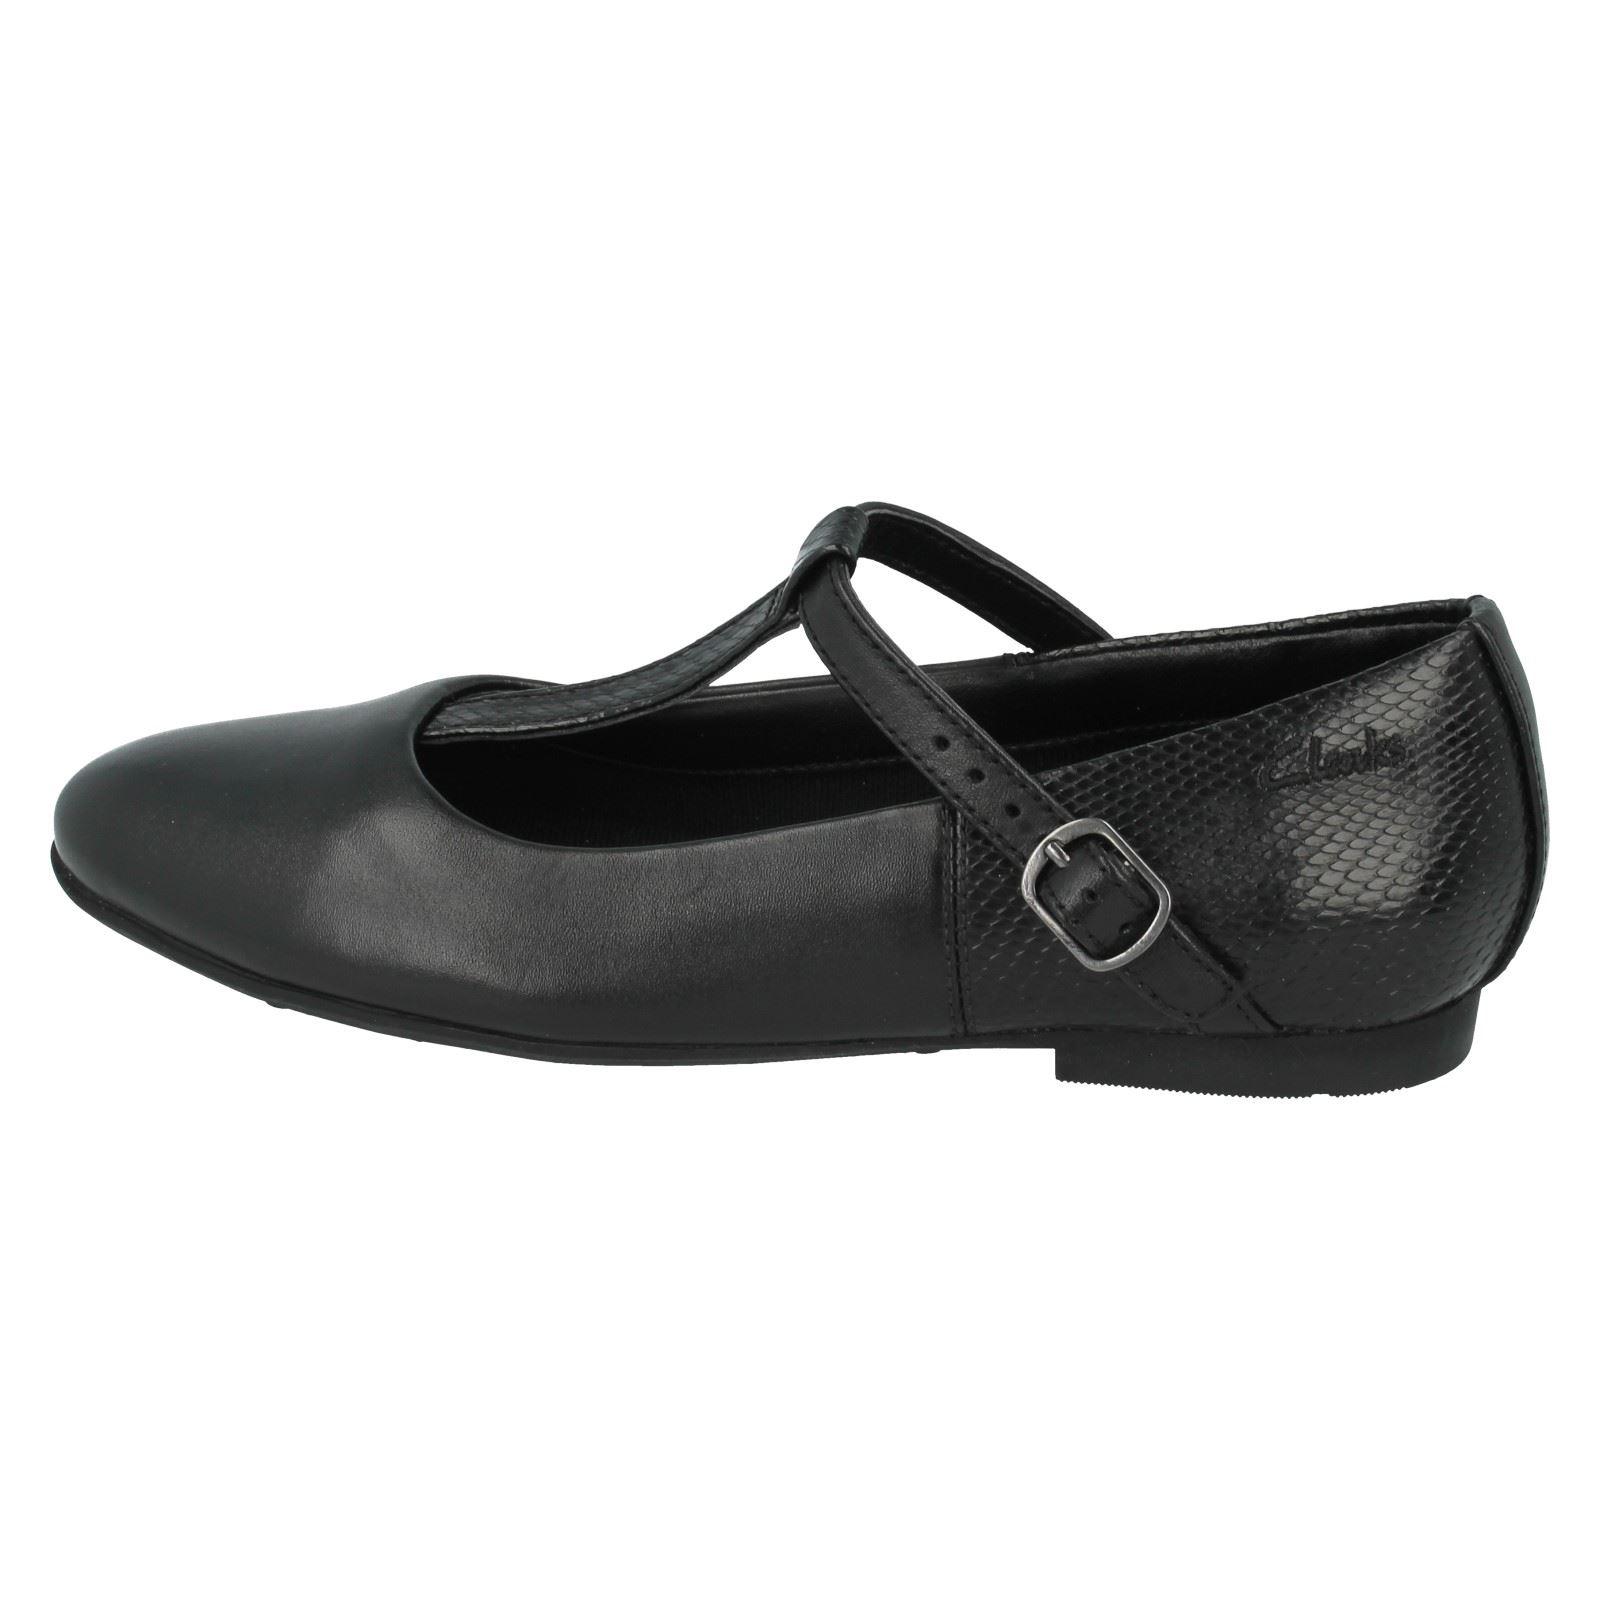 Chicas Clarks Zapatos Etiqueta Erica Lola